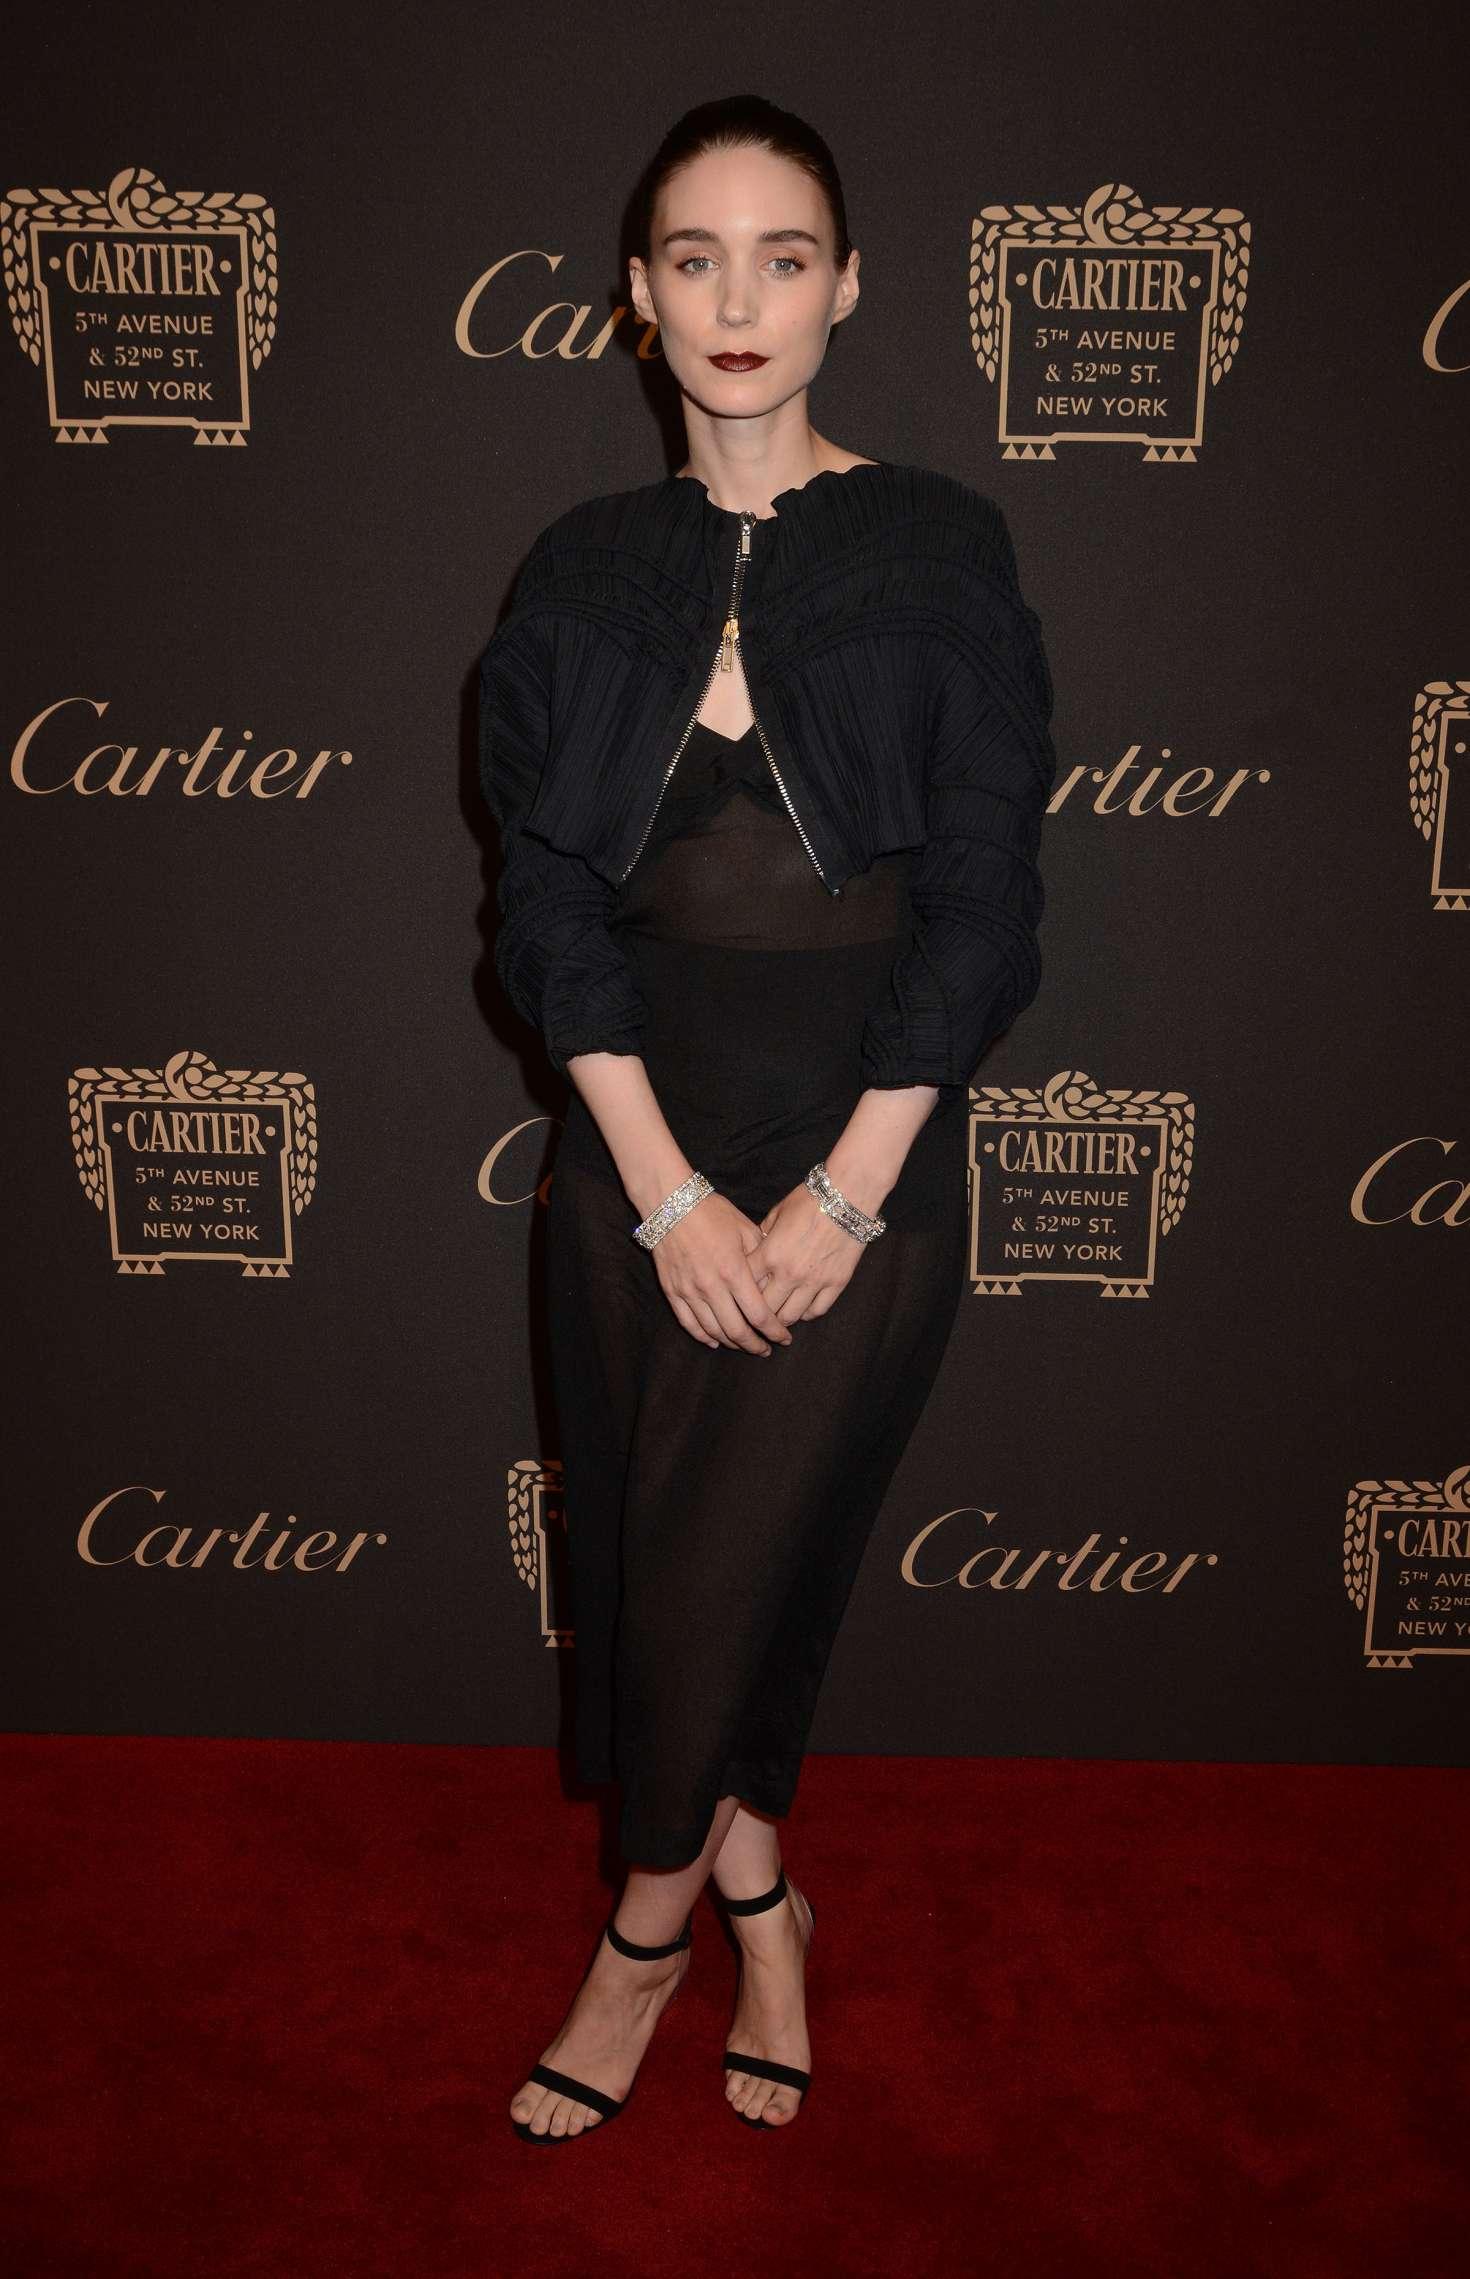 Rooney Mara - Cartier Store Grand Reopening in New York